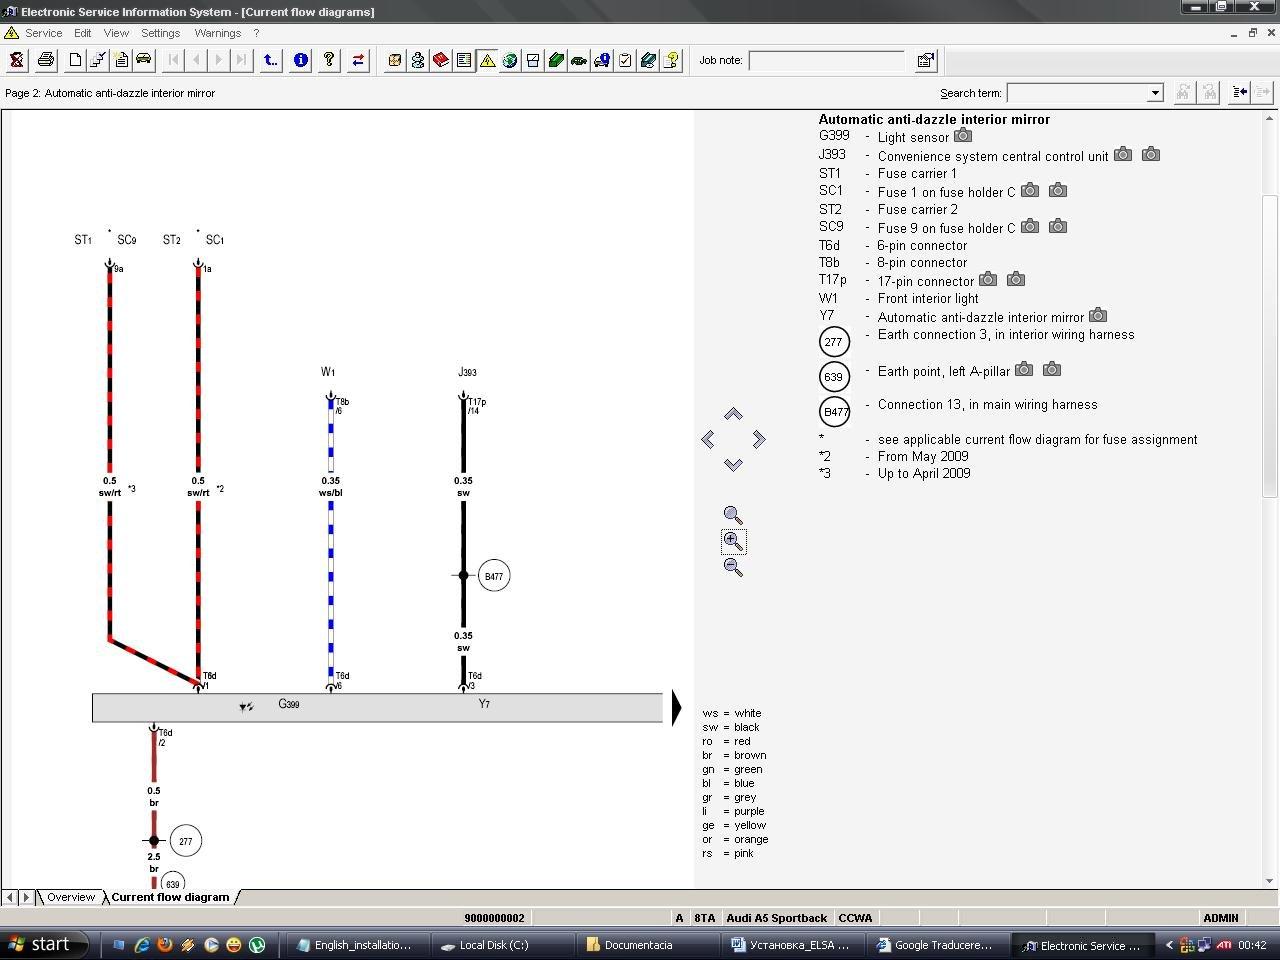 Audi q5 xenon wiring diagram 2000 golf 20 engine diagram gas retrofit of headlight assistant audi a5 forum audi s5 forum attachment 18767 retrofit headlight assistanthtml audi q5 xenon wiring diagram audi q5 xenon swarovskicordoba Images